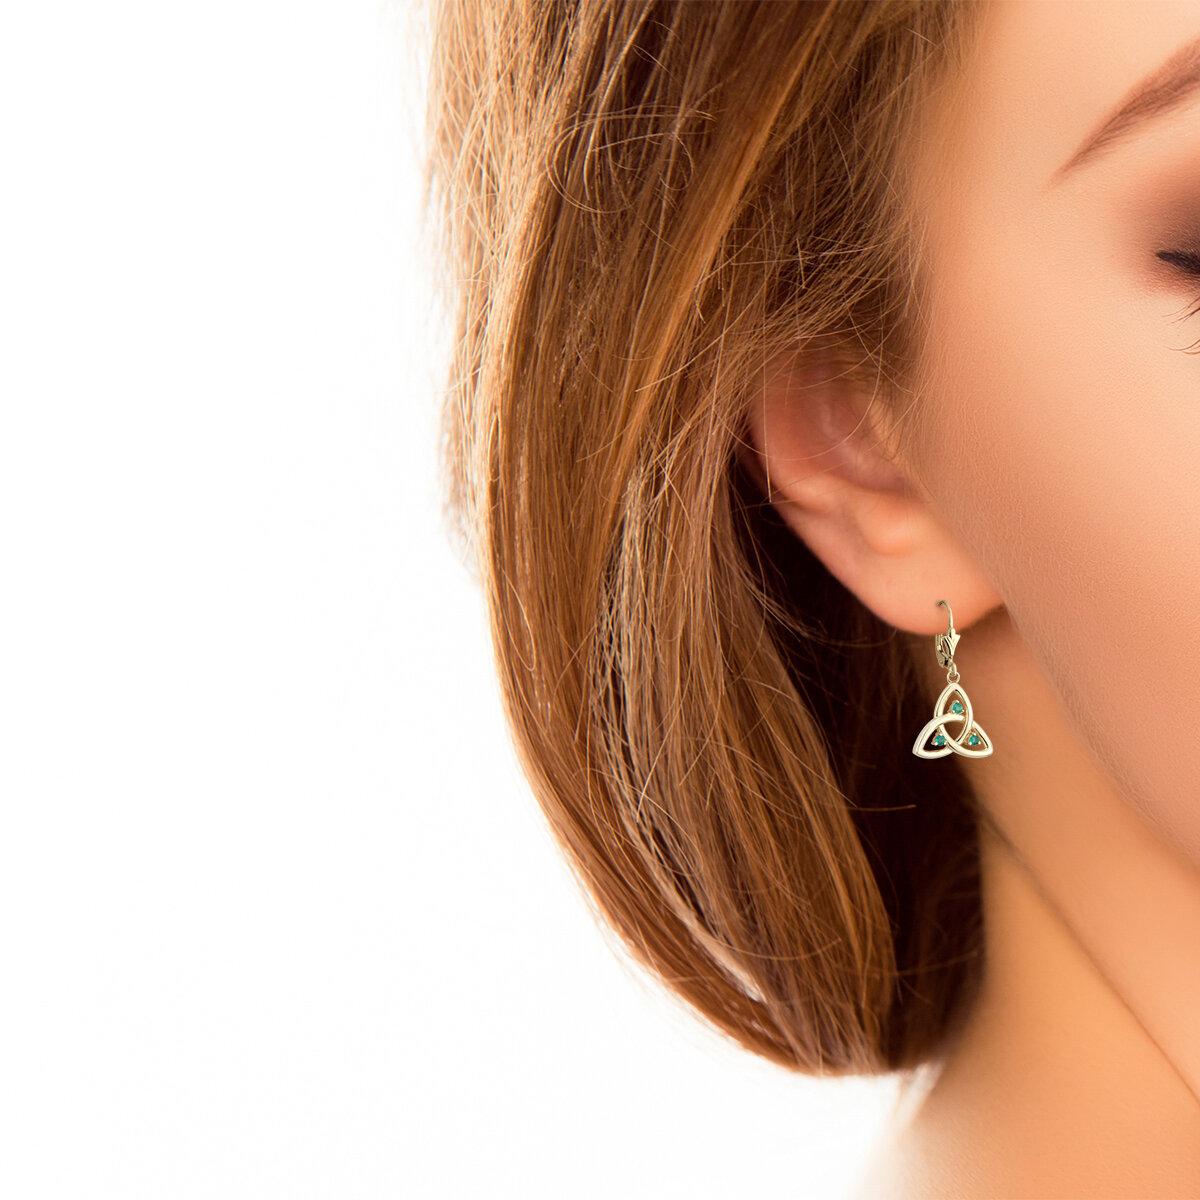 14 karat gold emerald trinity knot drop earrings S33450 presented on a model